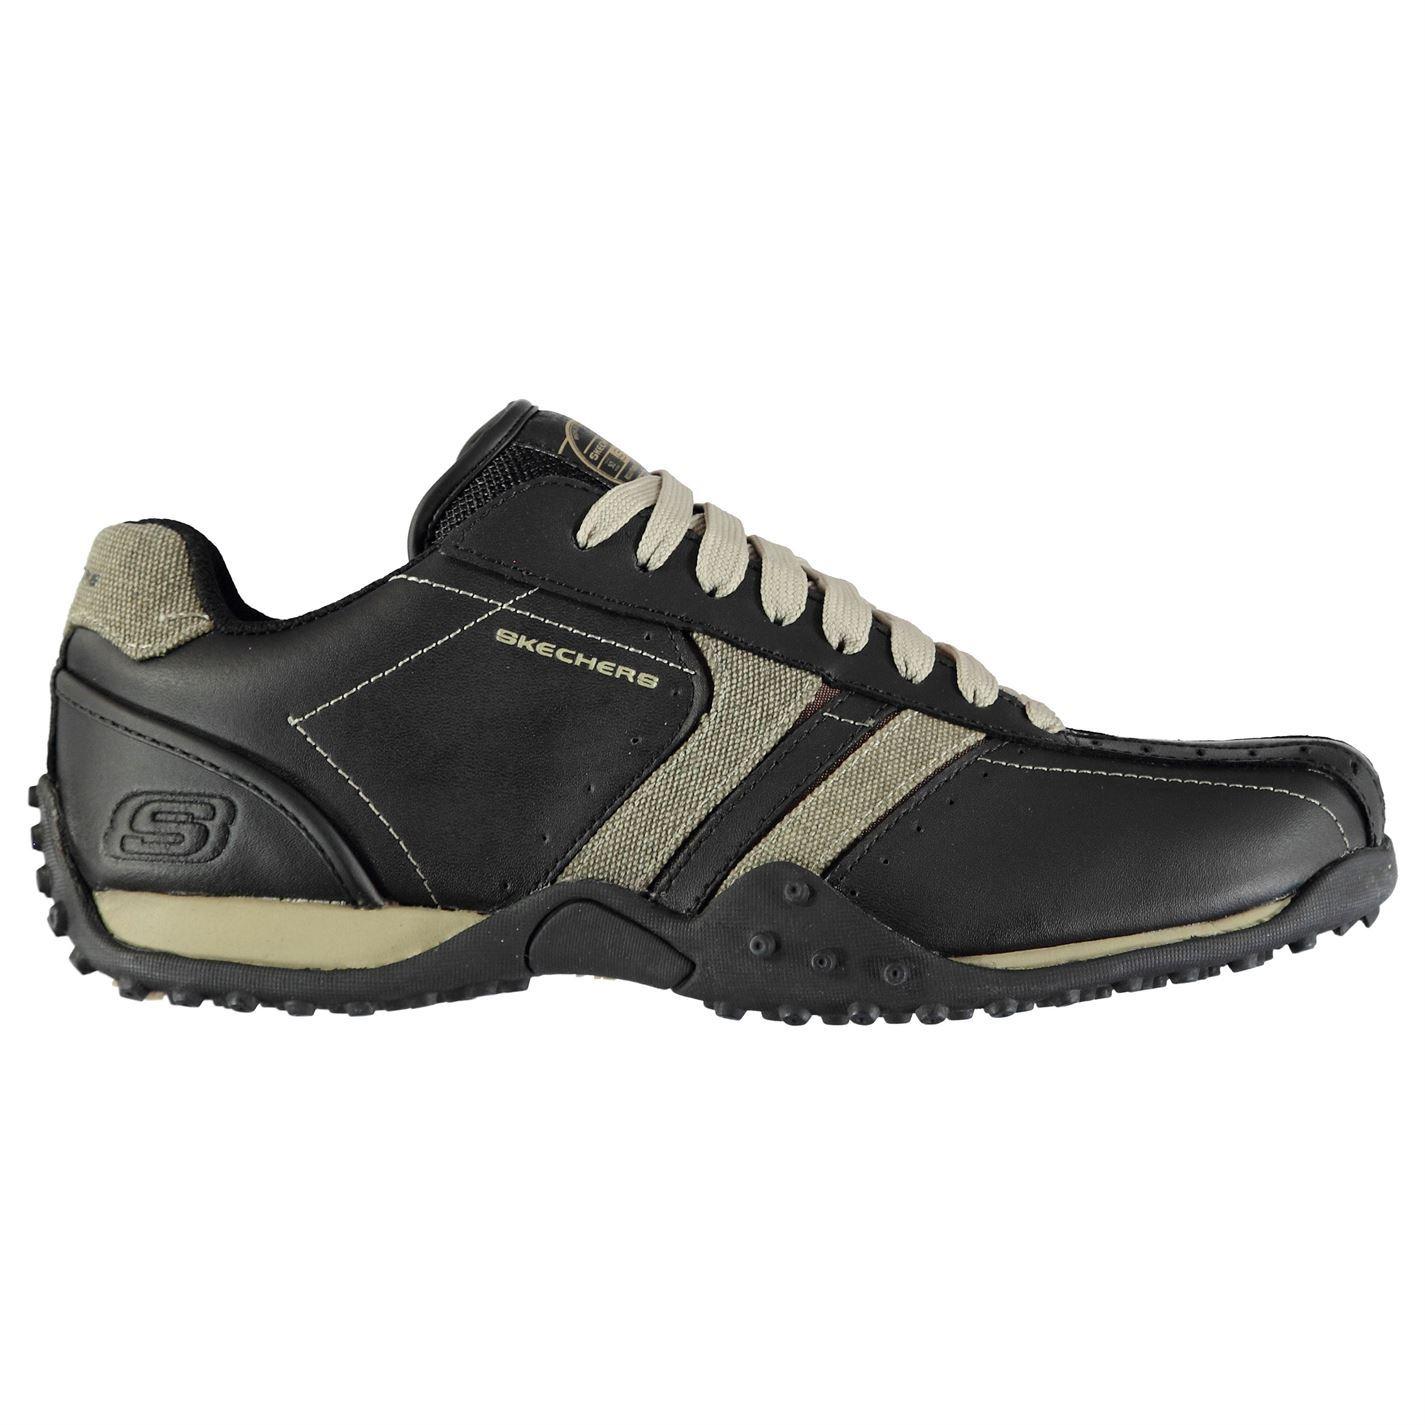 Skechers-Urban-Track-Forward-Trainers-Mens-Athleisure-Footwear-Shoes-Sneakers thumbnail 12